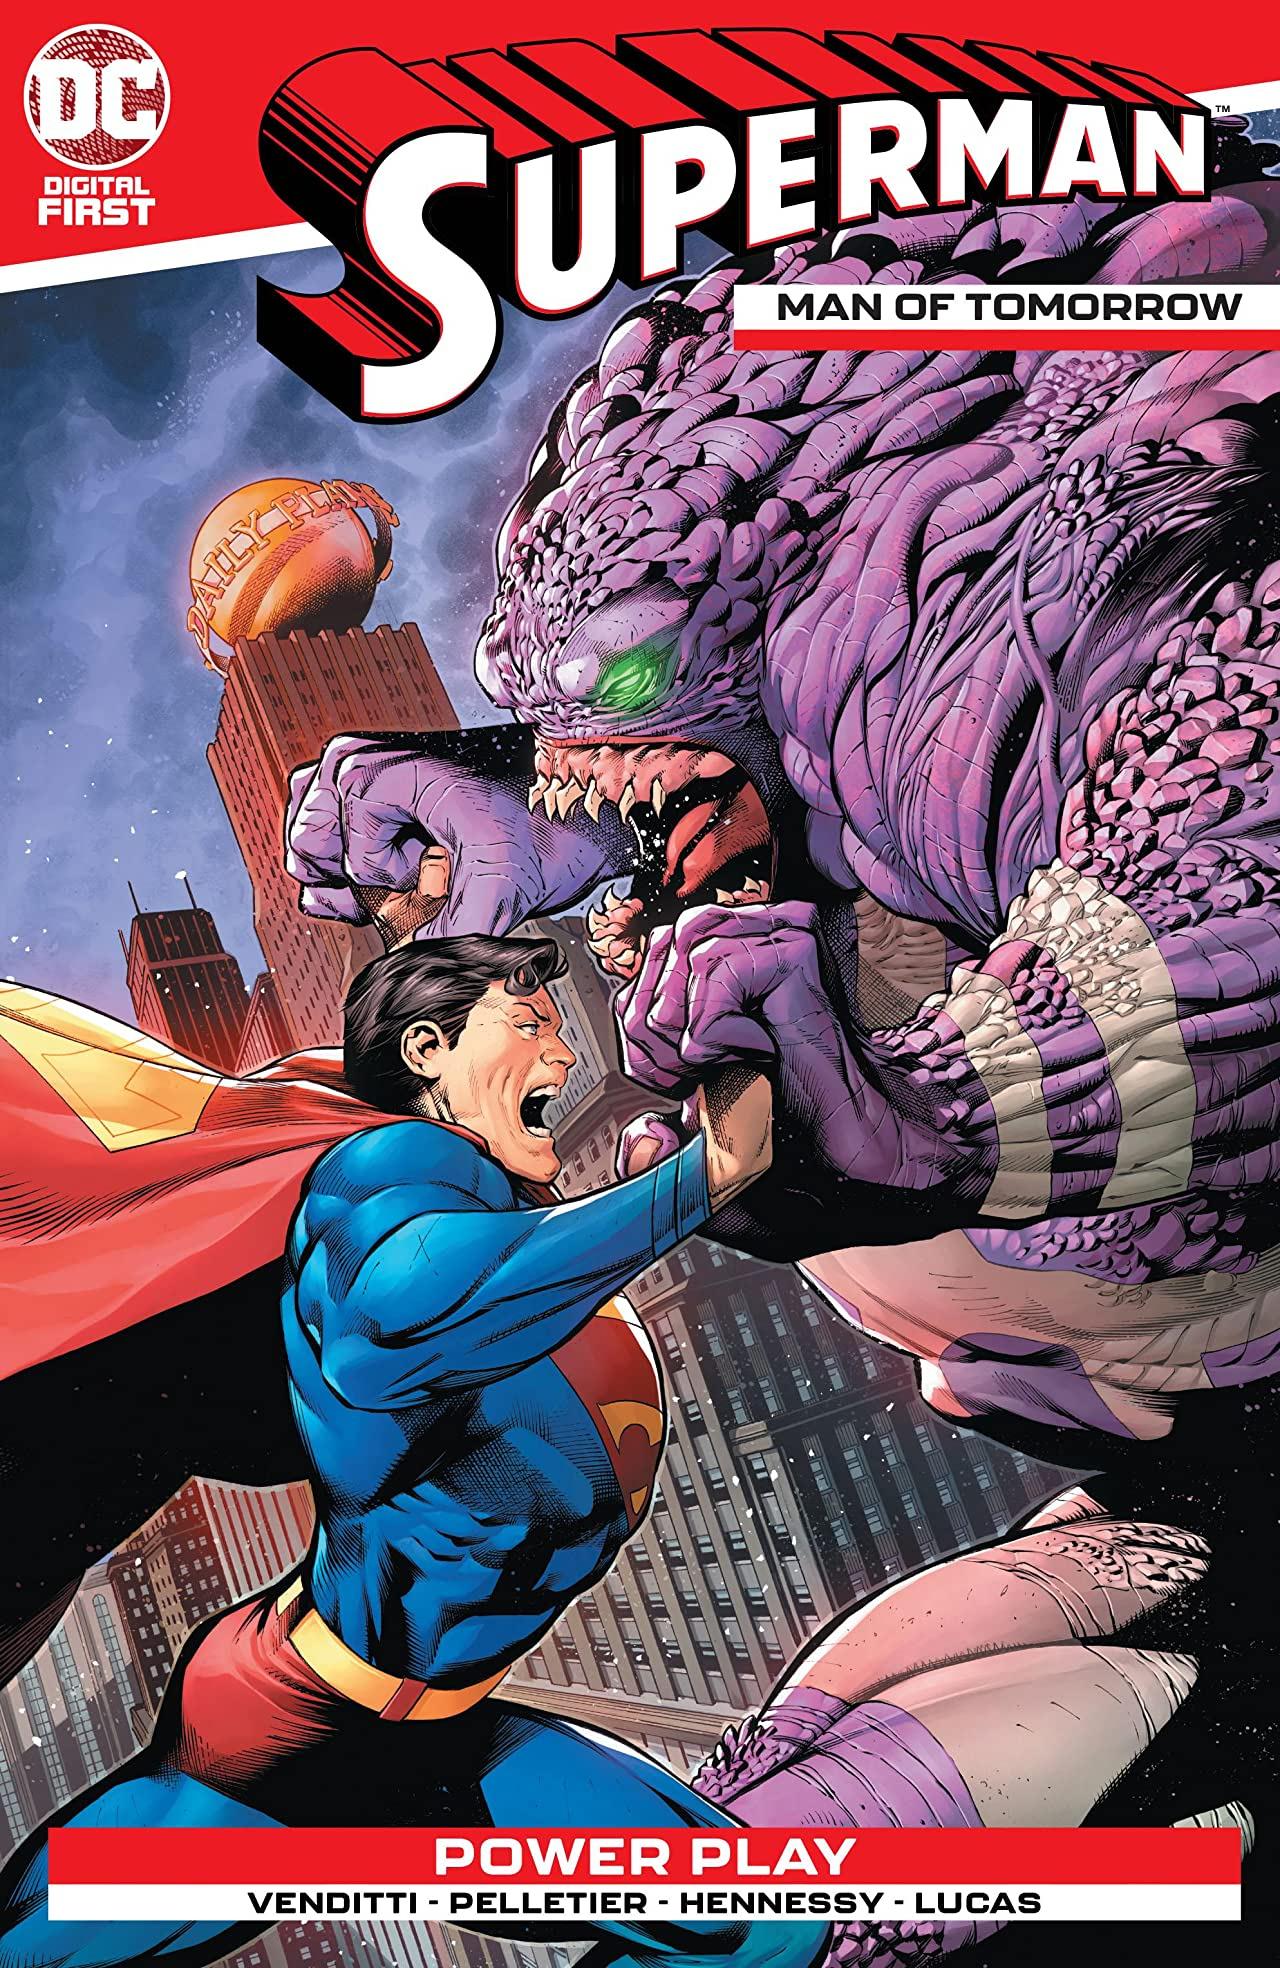 Superman: Man of Tomorrow #1 - DC Entertainment